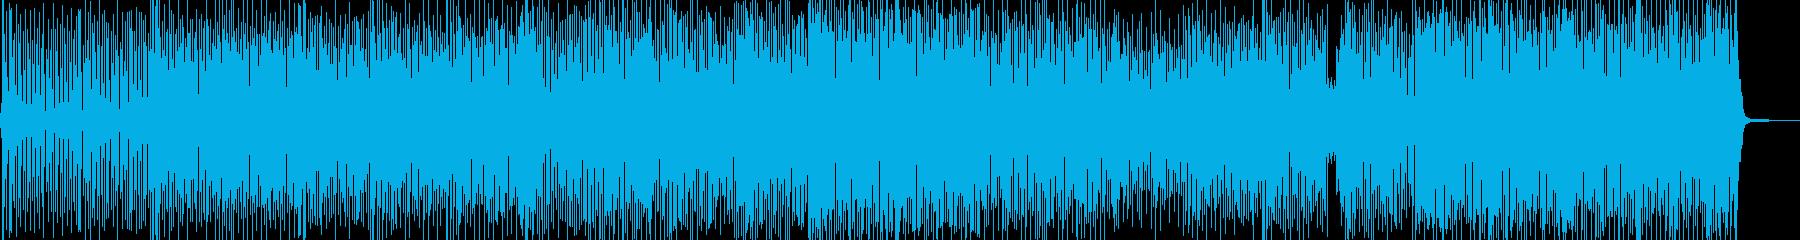 (。^U^)bなスカポップの再生済みの波形